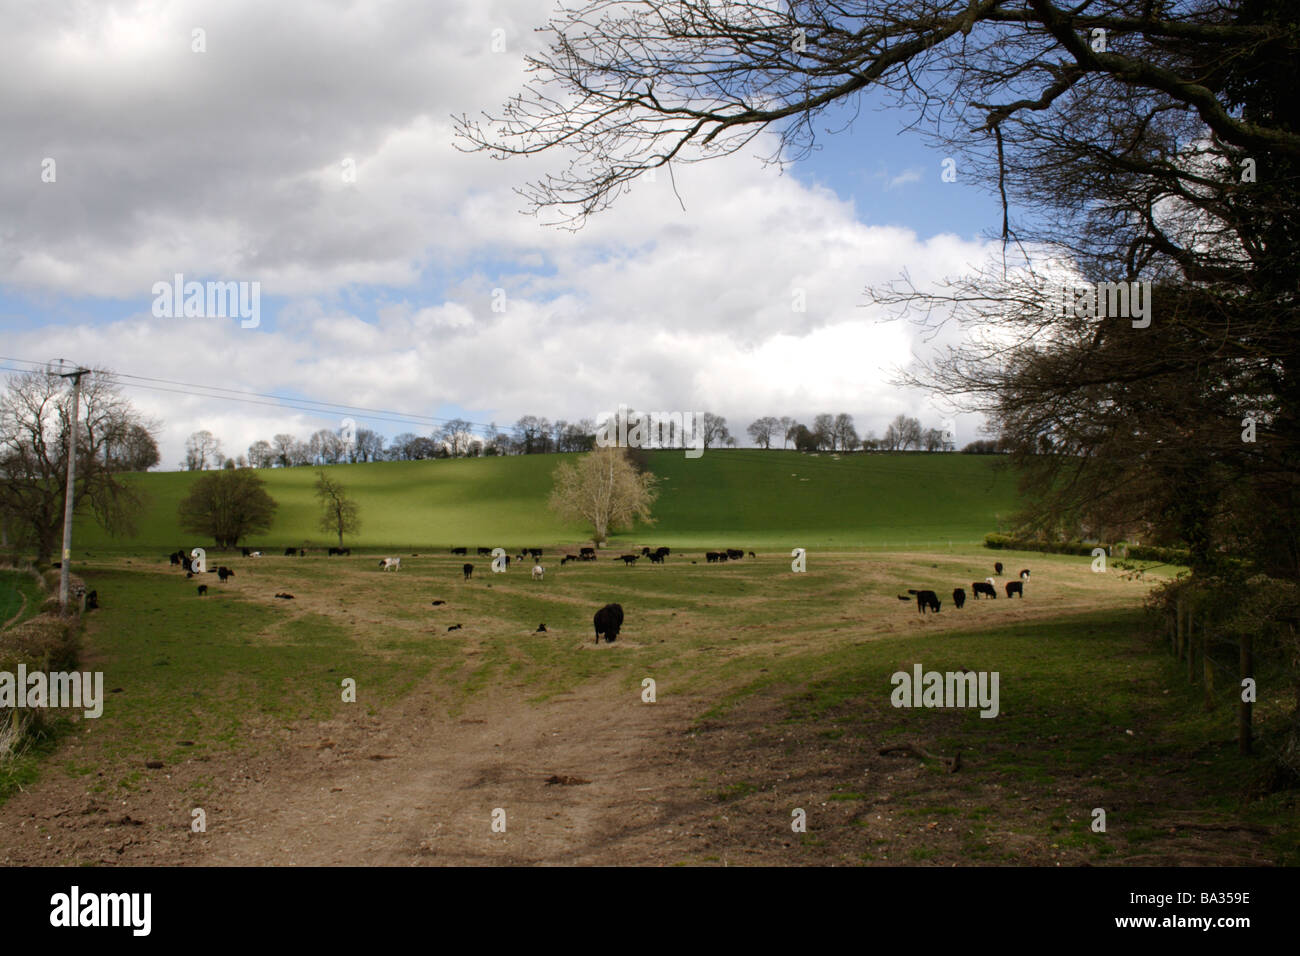 Chilterns Buckinghamshire - Stock Image